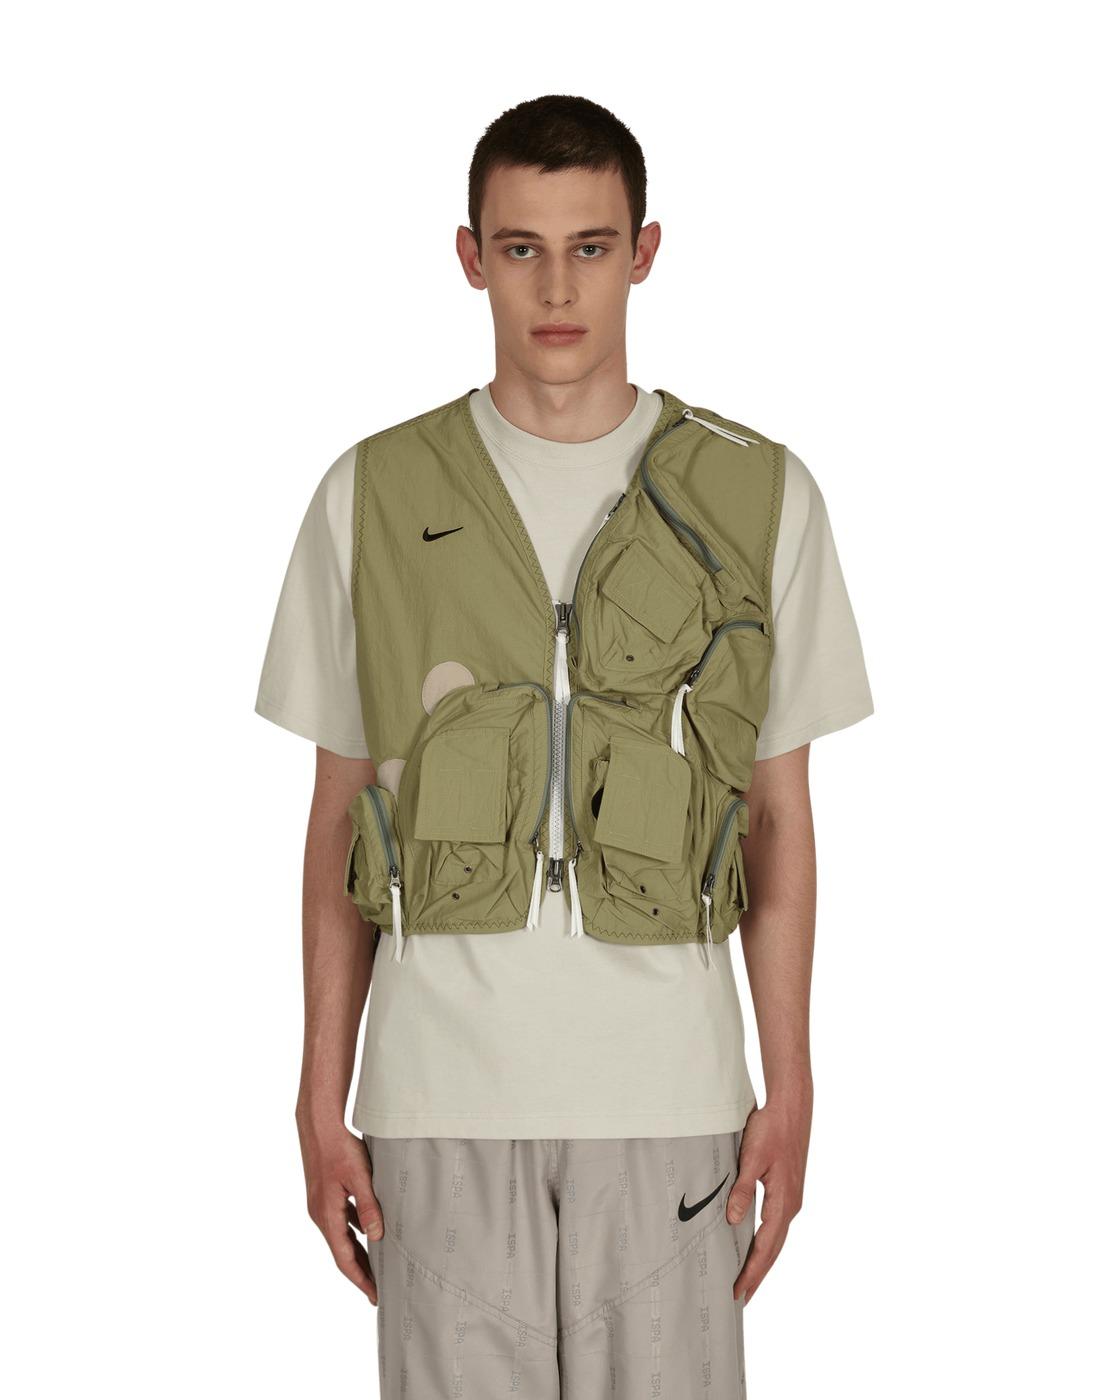 Photo: Nike Special Project Ispa Utility Vest Medium Khaki